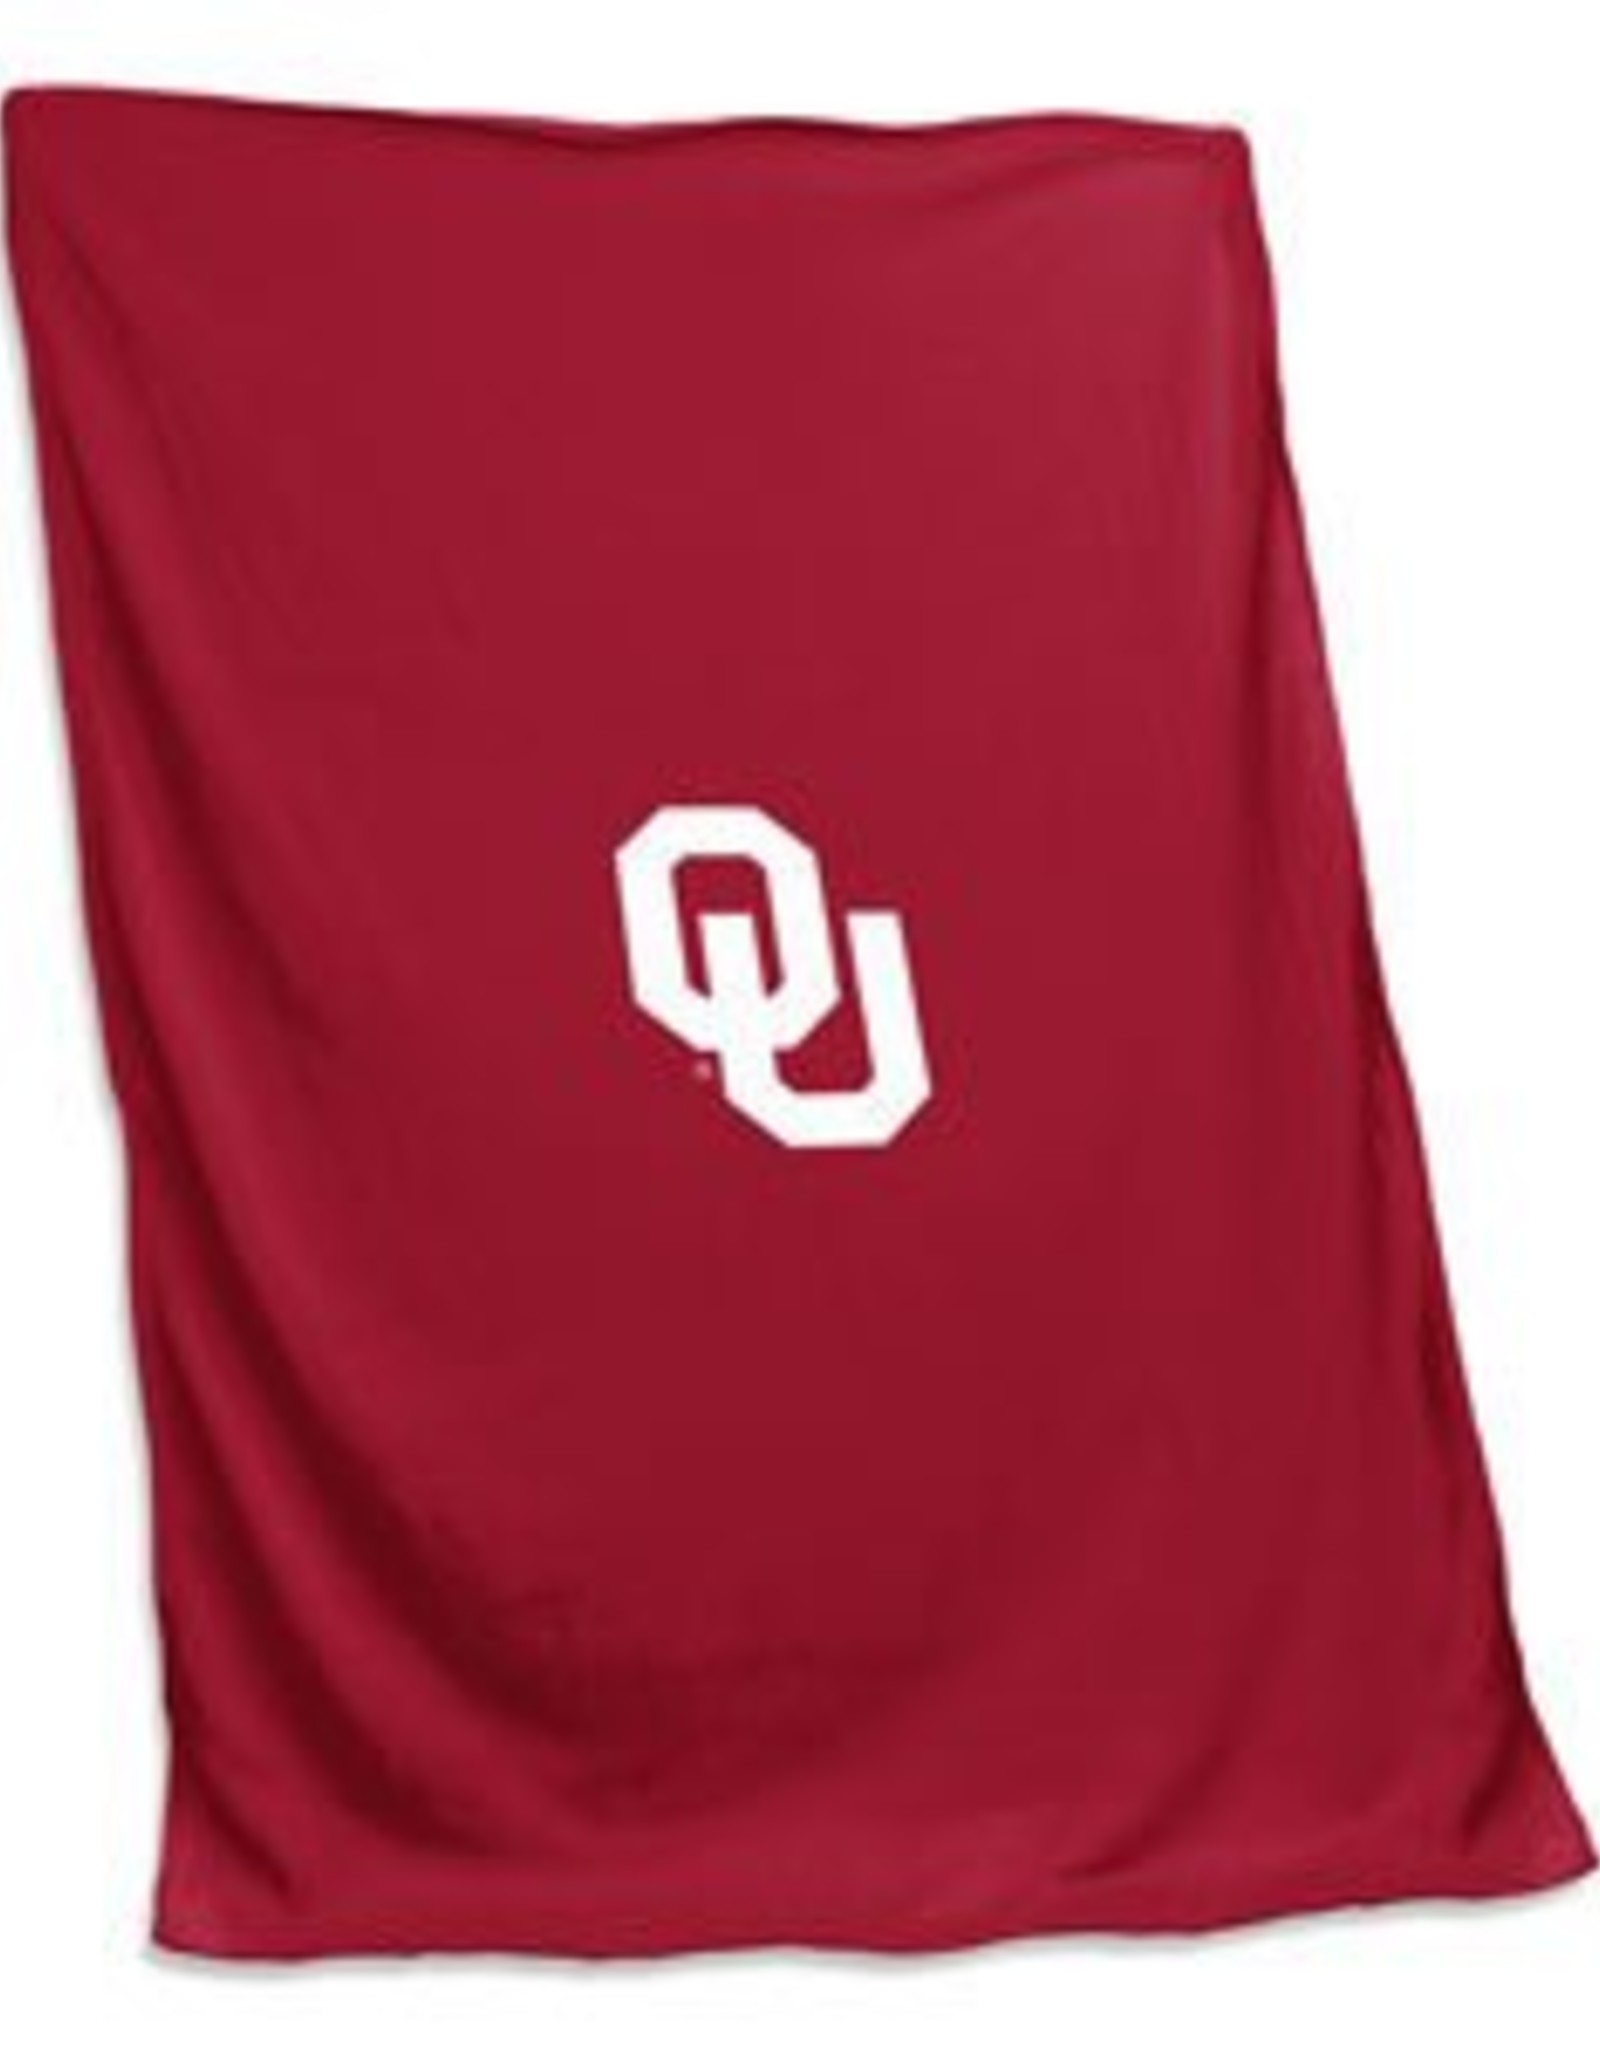 "Logo Logo Brands Sweatshirt Blanket Applique OU 84""x54"""